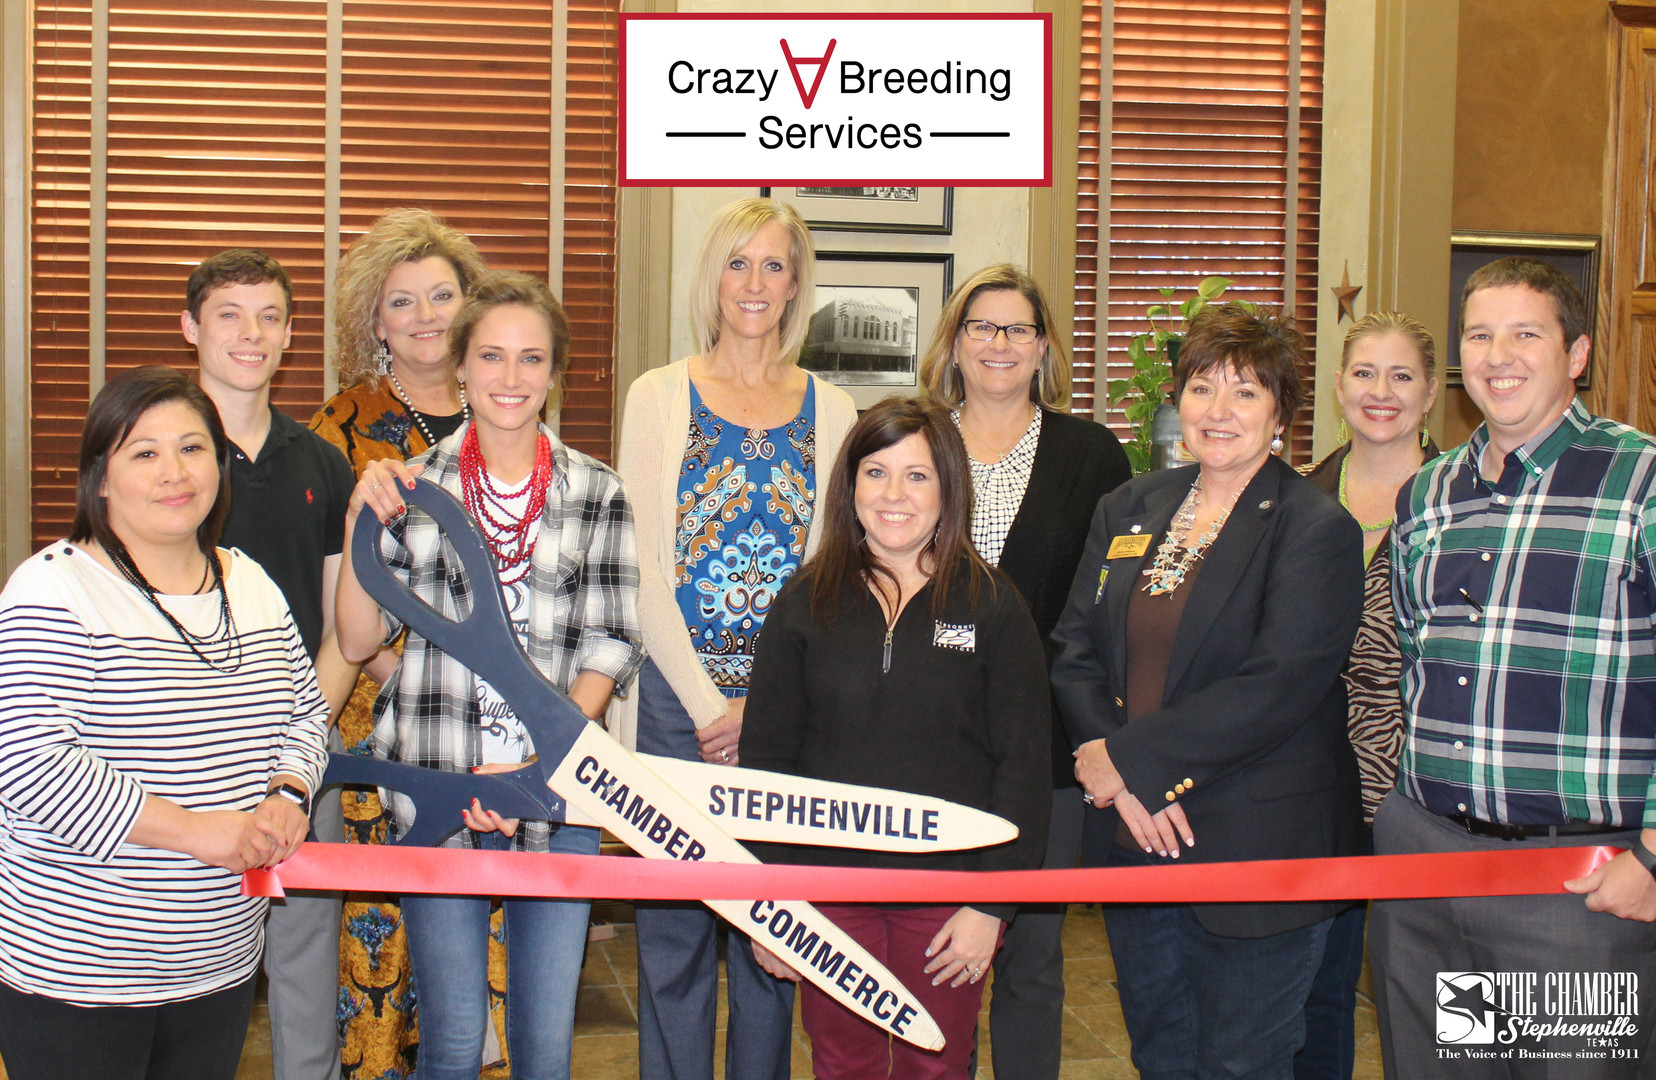 Crazy A Breeding Services - January 9, 2